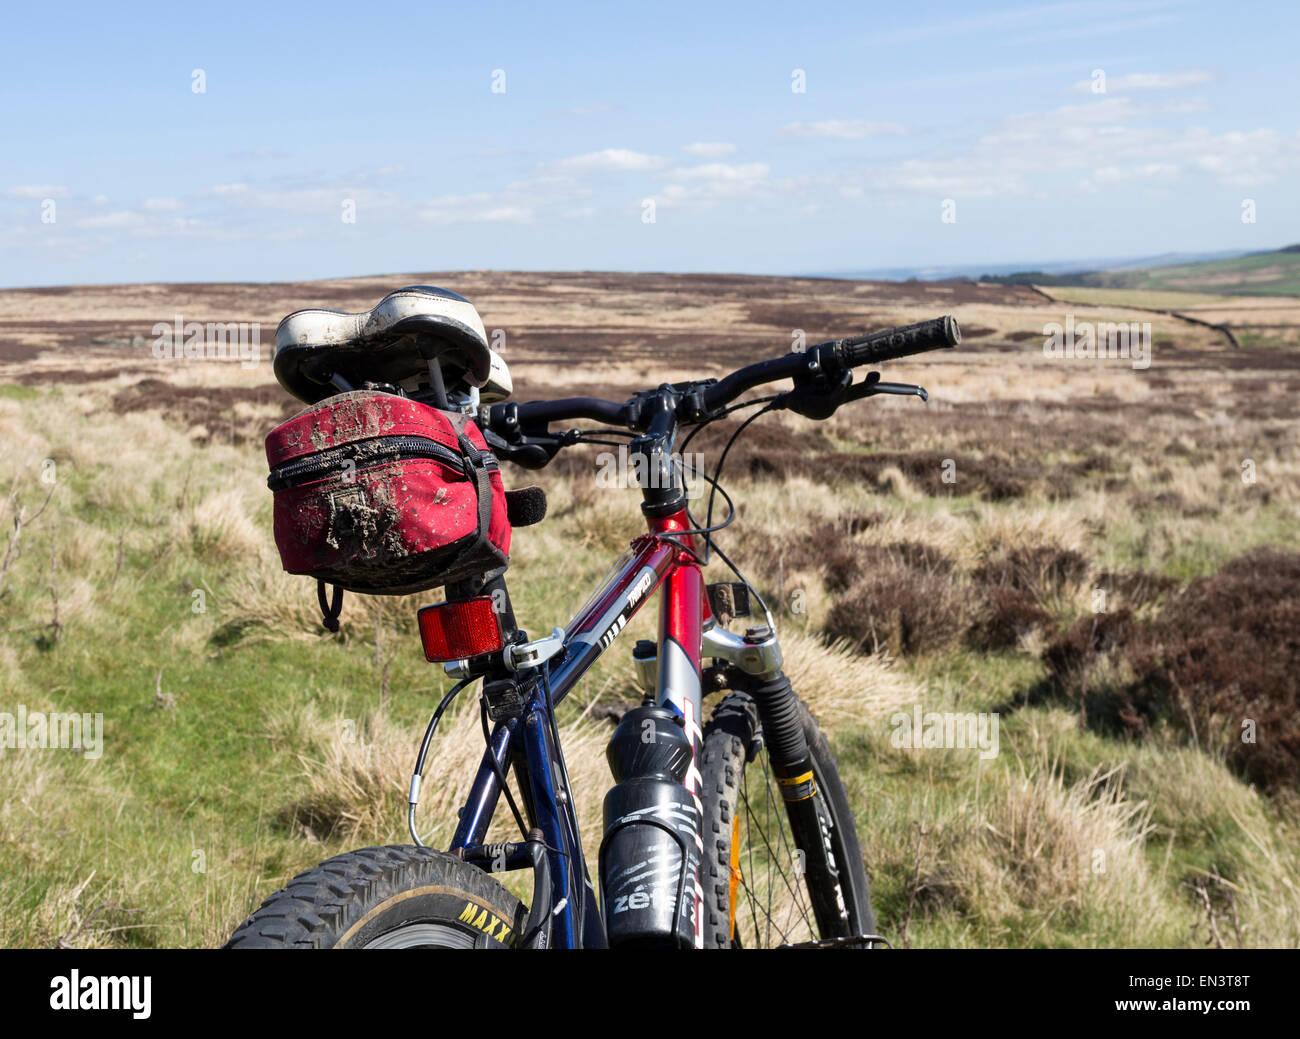 Mountain Bike in Moorland Setting UK - Stock Image